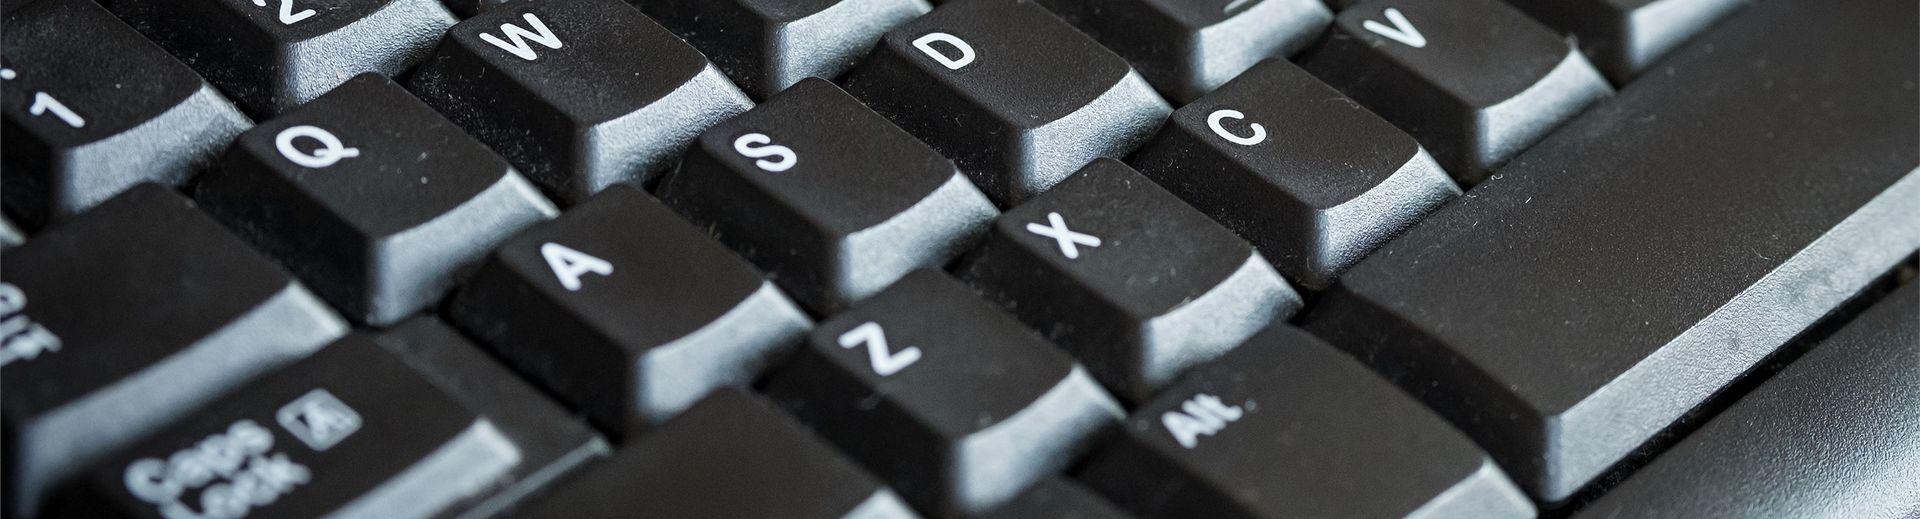 A close-up look of a grey computer keyboard.